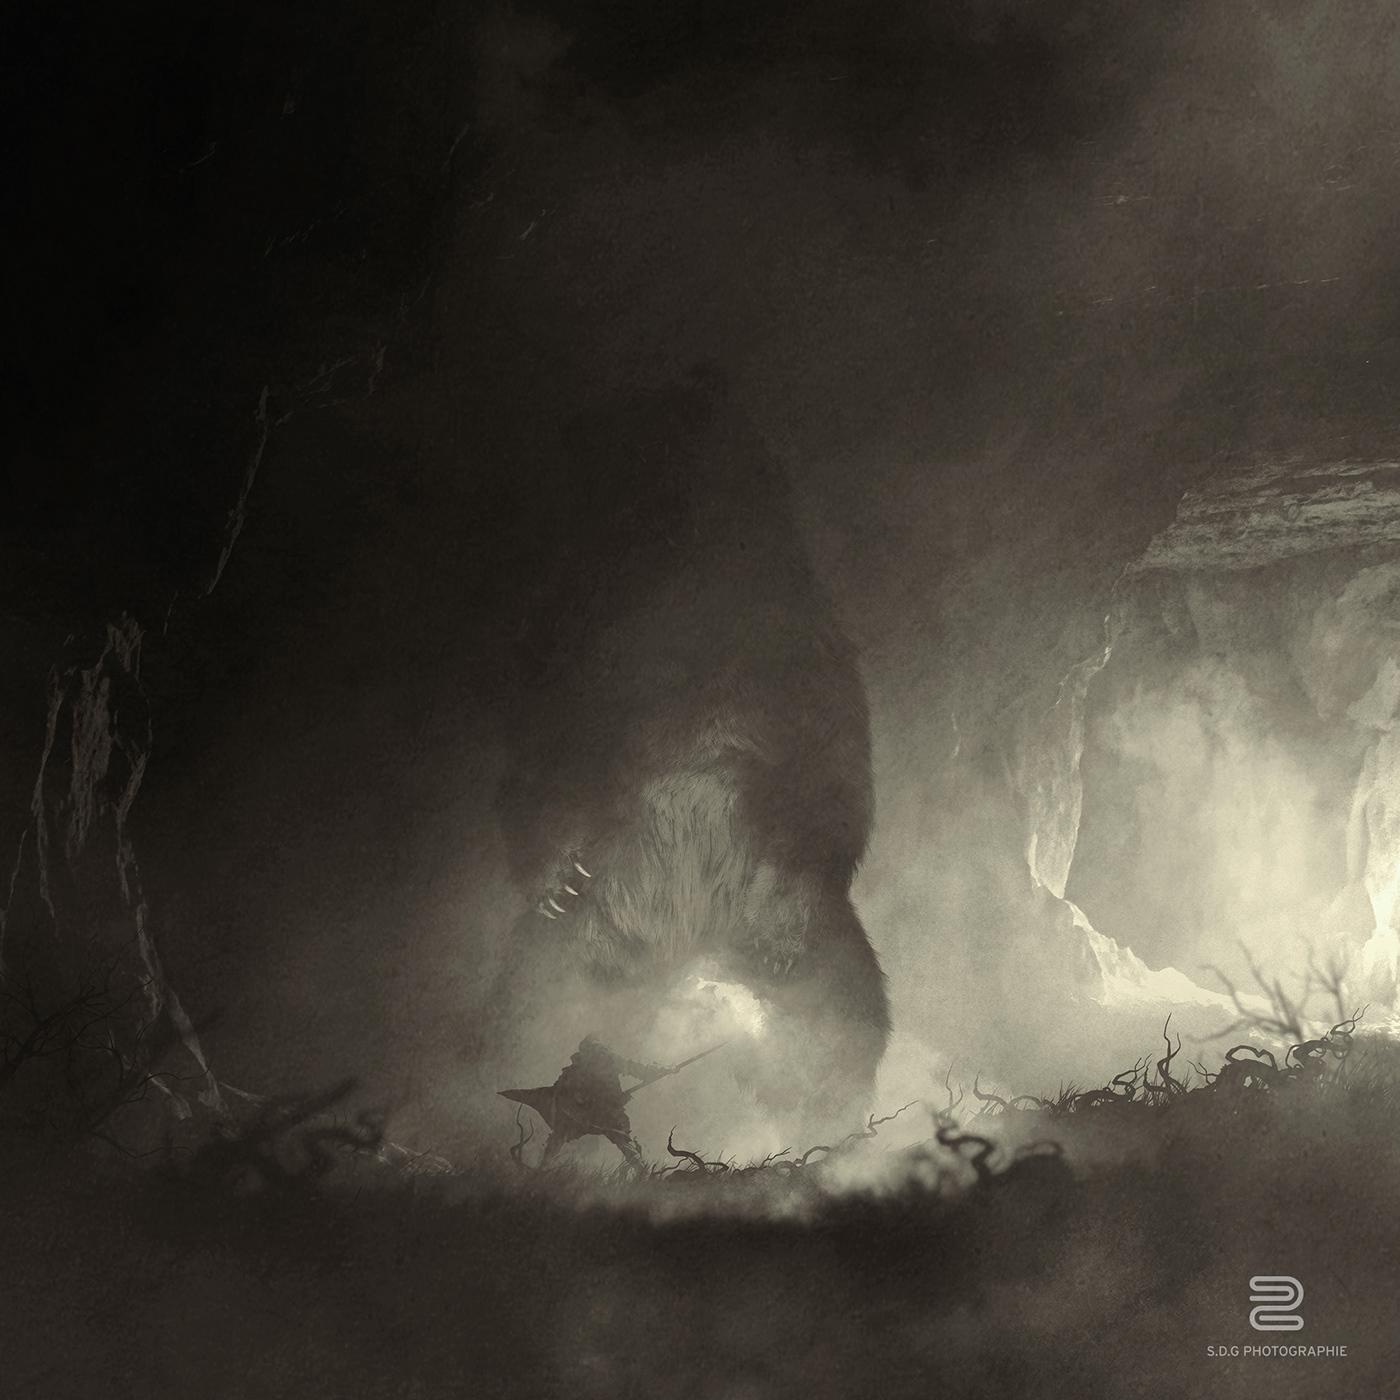 photoshop guardians animals Giants giant monster Silhouette dark